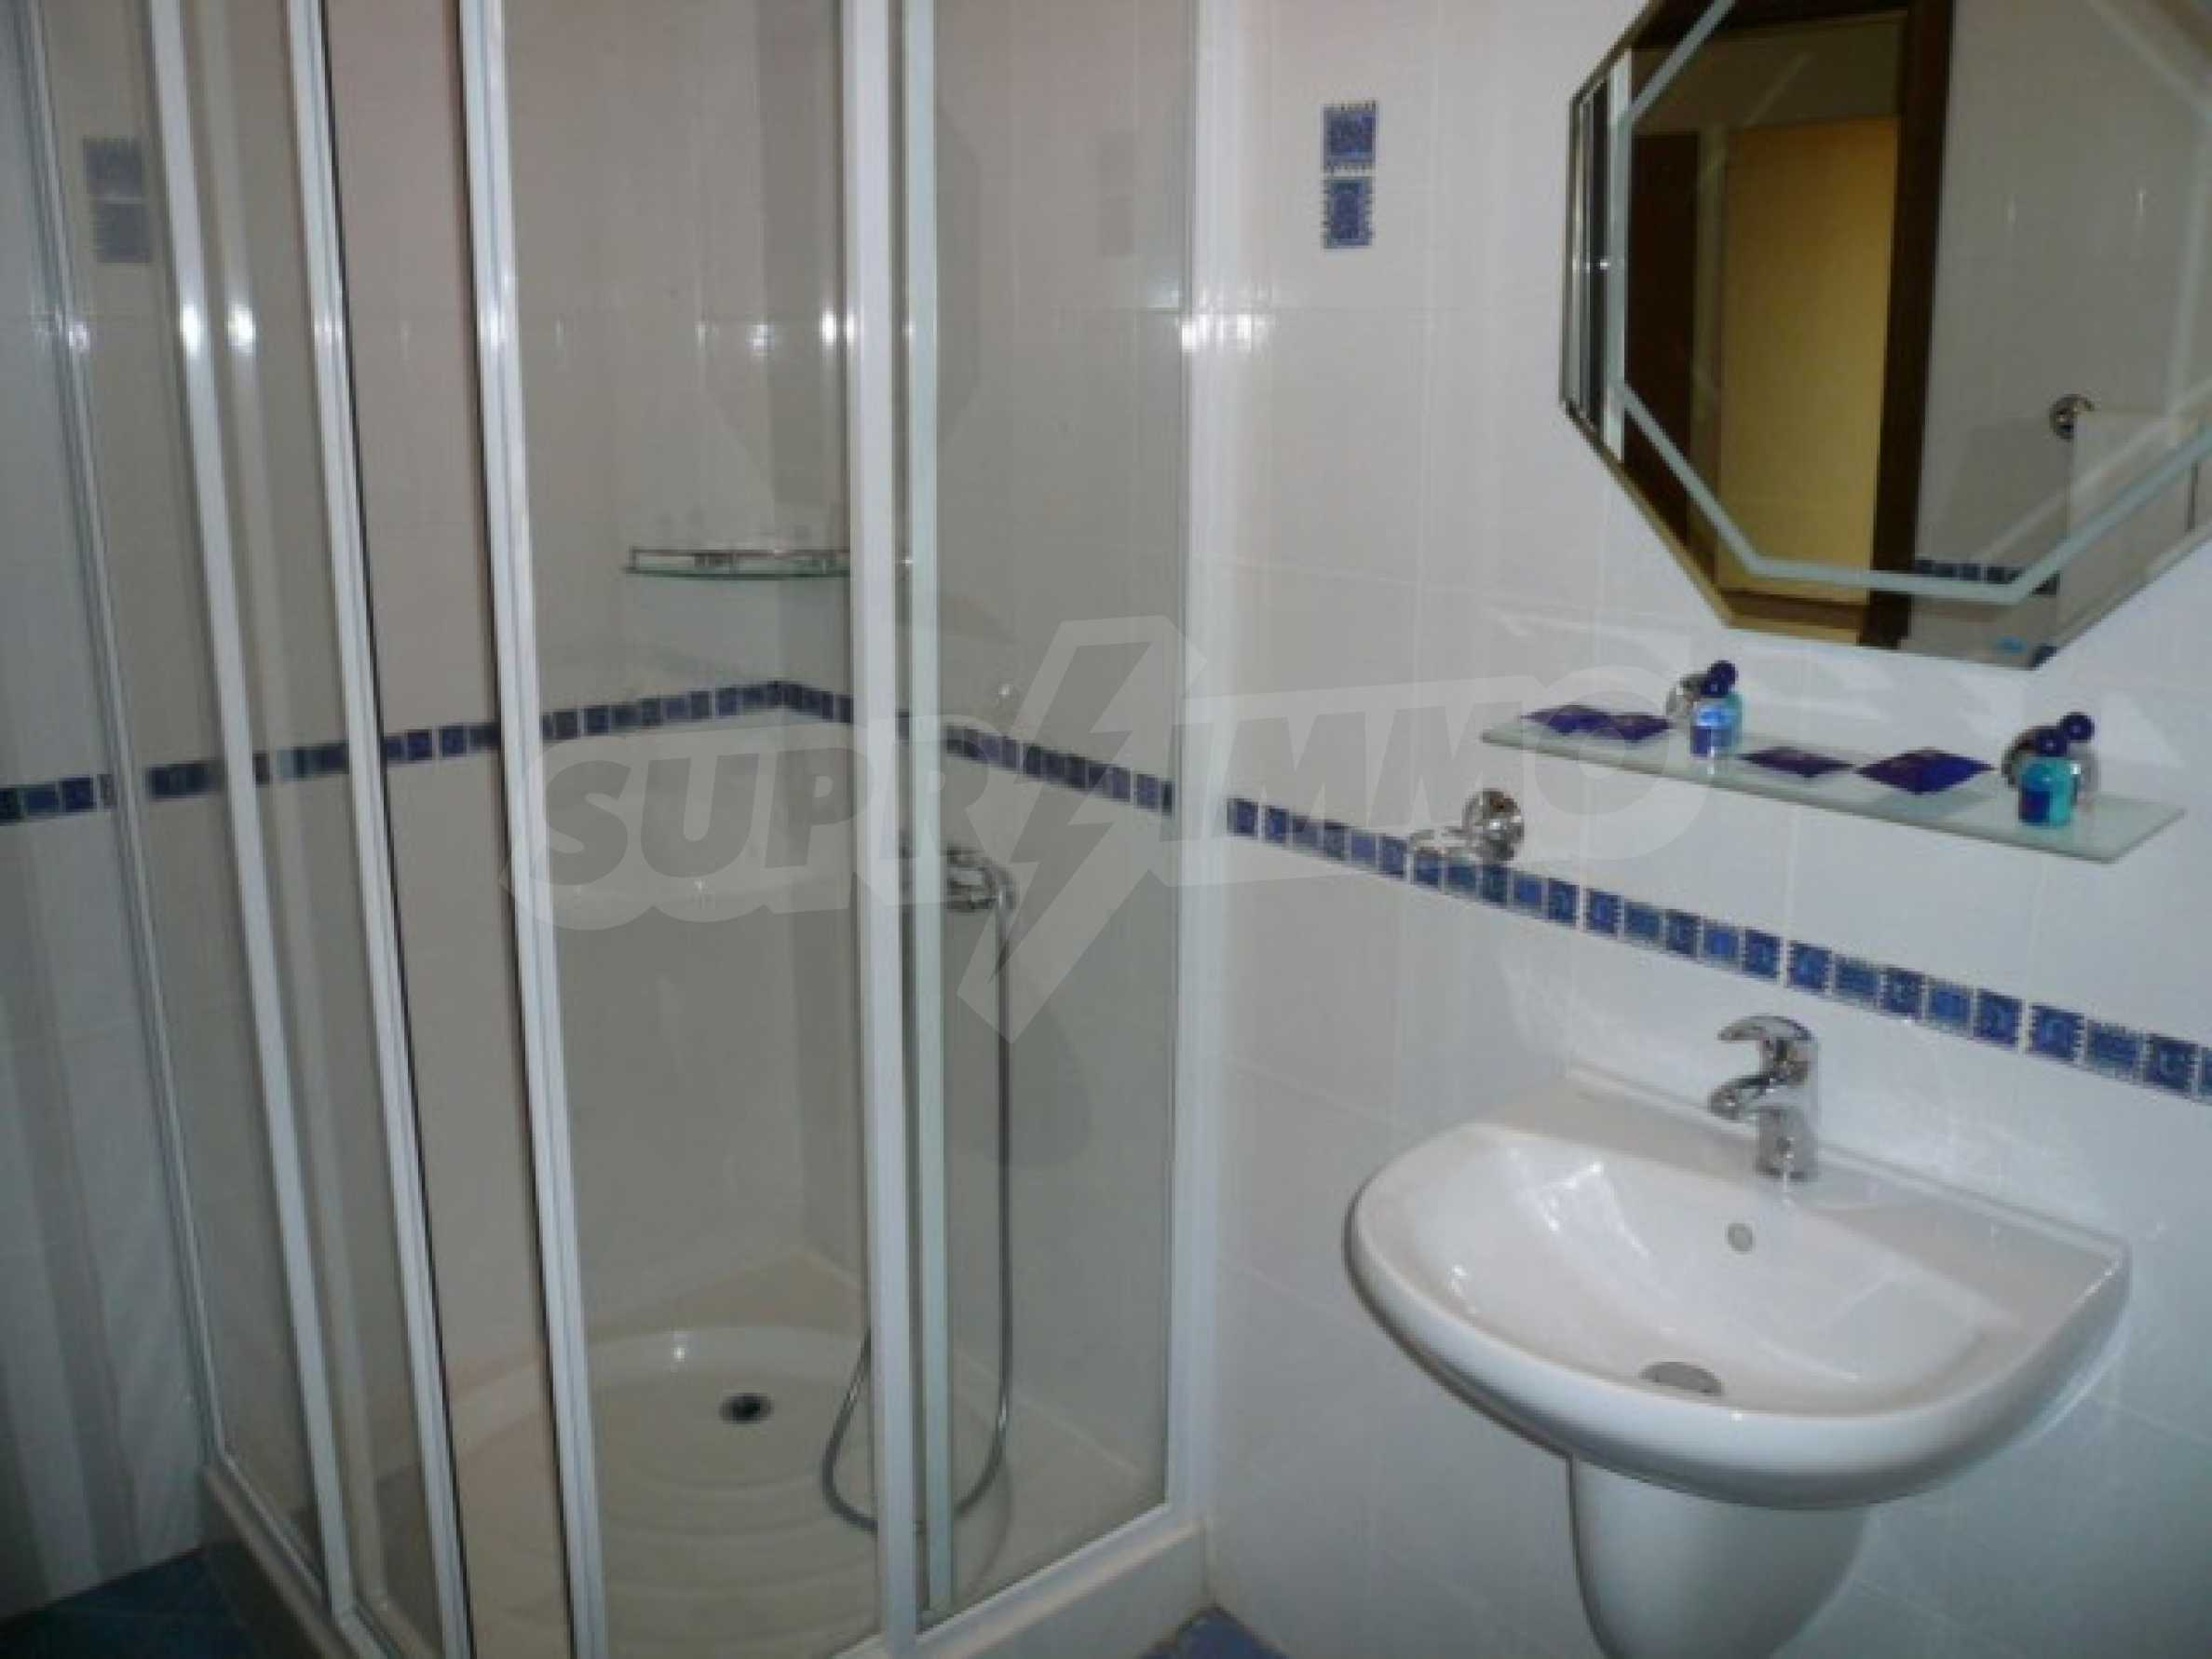 Двустаен апартамент за продажба в гр. Банско 8